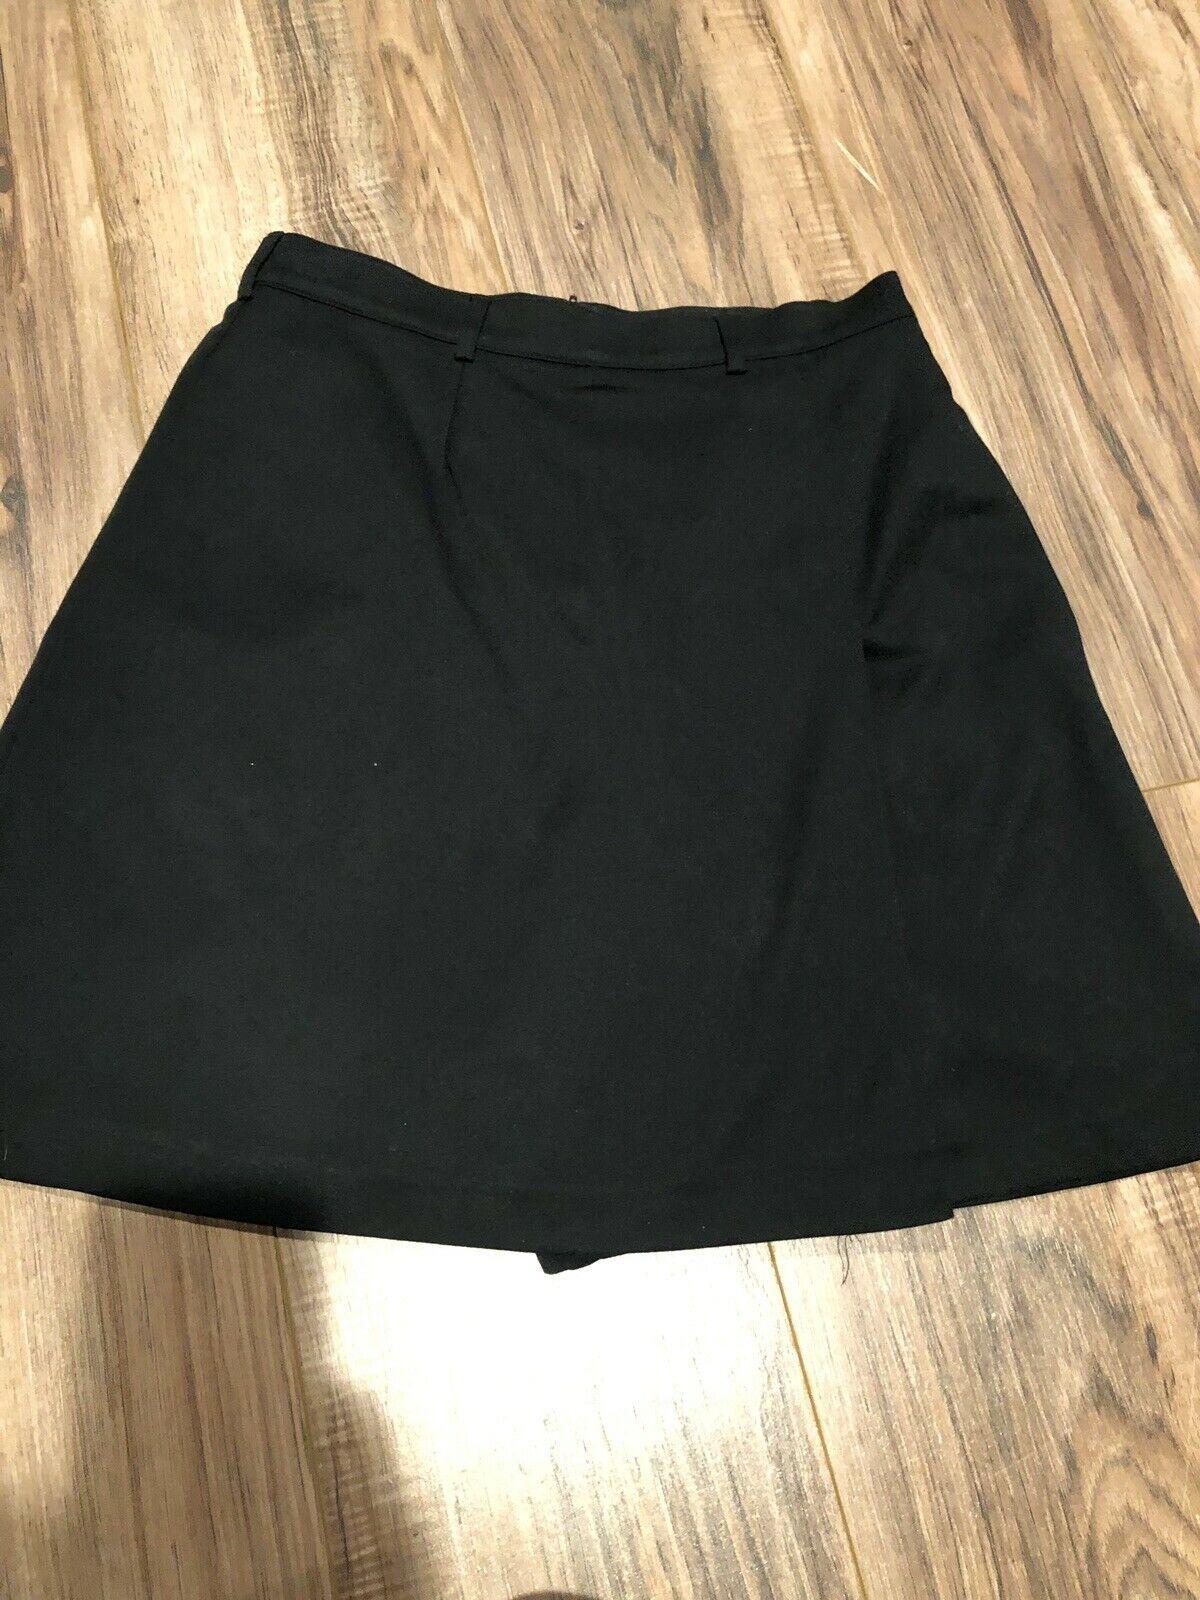 Tail Athletic Skort Tennis Golf Skirt Shorts Black Size 4 With Pockets Golf Skort Trending Golf Skort For S Golf Skirts Womens Golf Shirts Tail Activewear